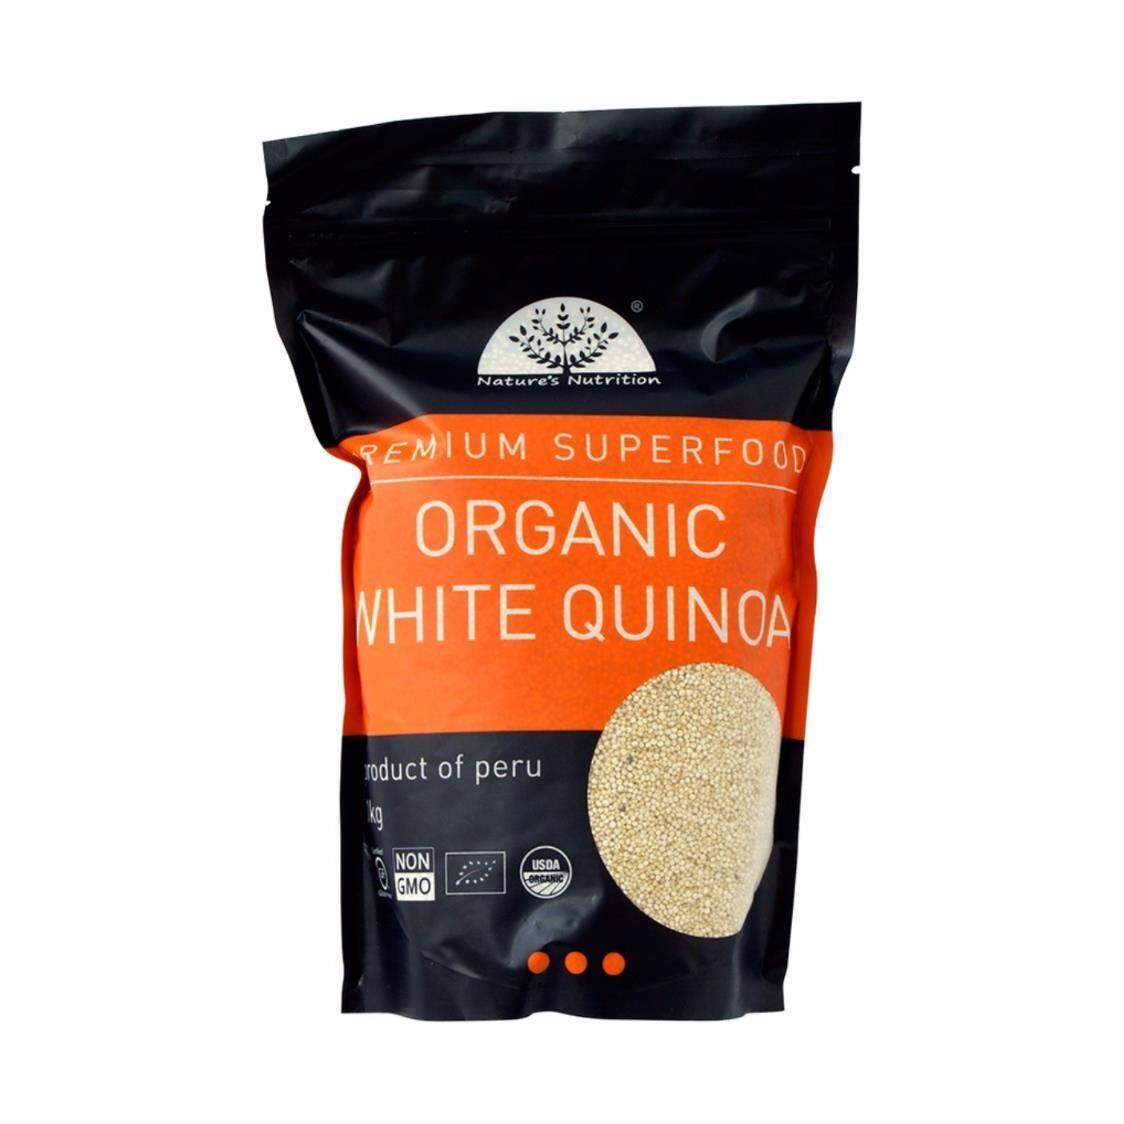 Natures Nutrition Organic White Quinoa 1kg